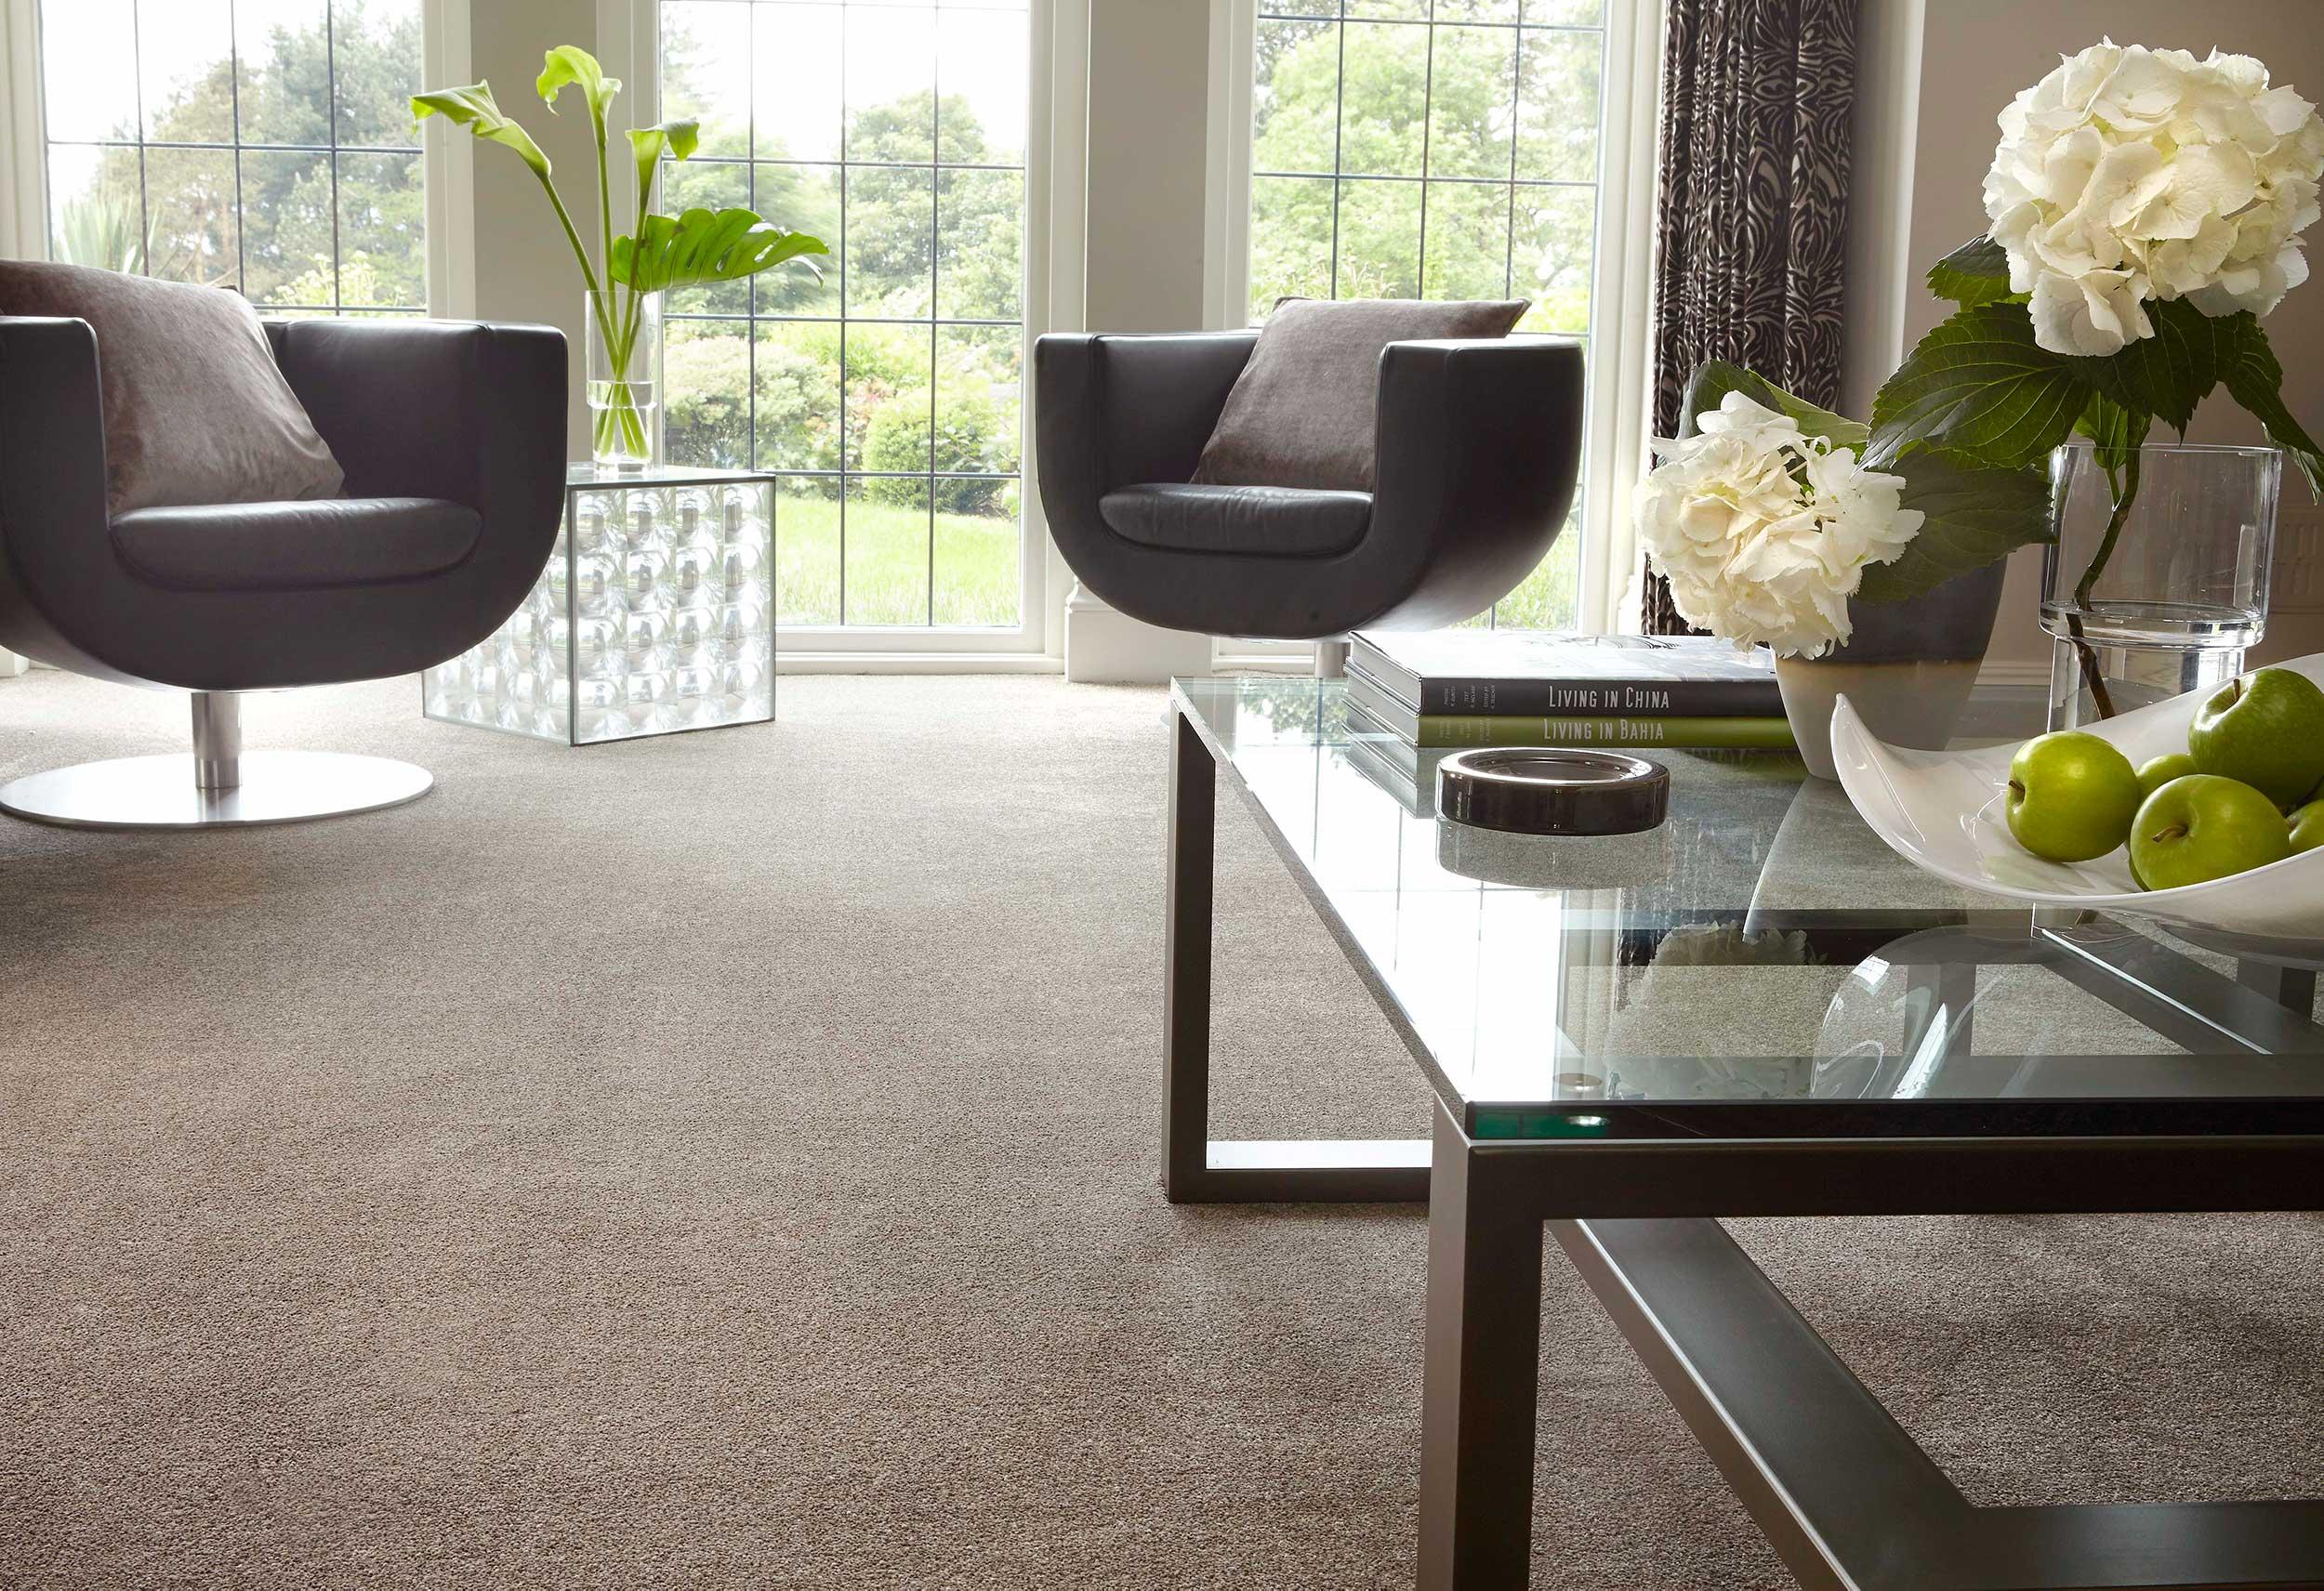 Cormar Carpets Gainsborough Carpets And Flooring